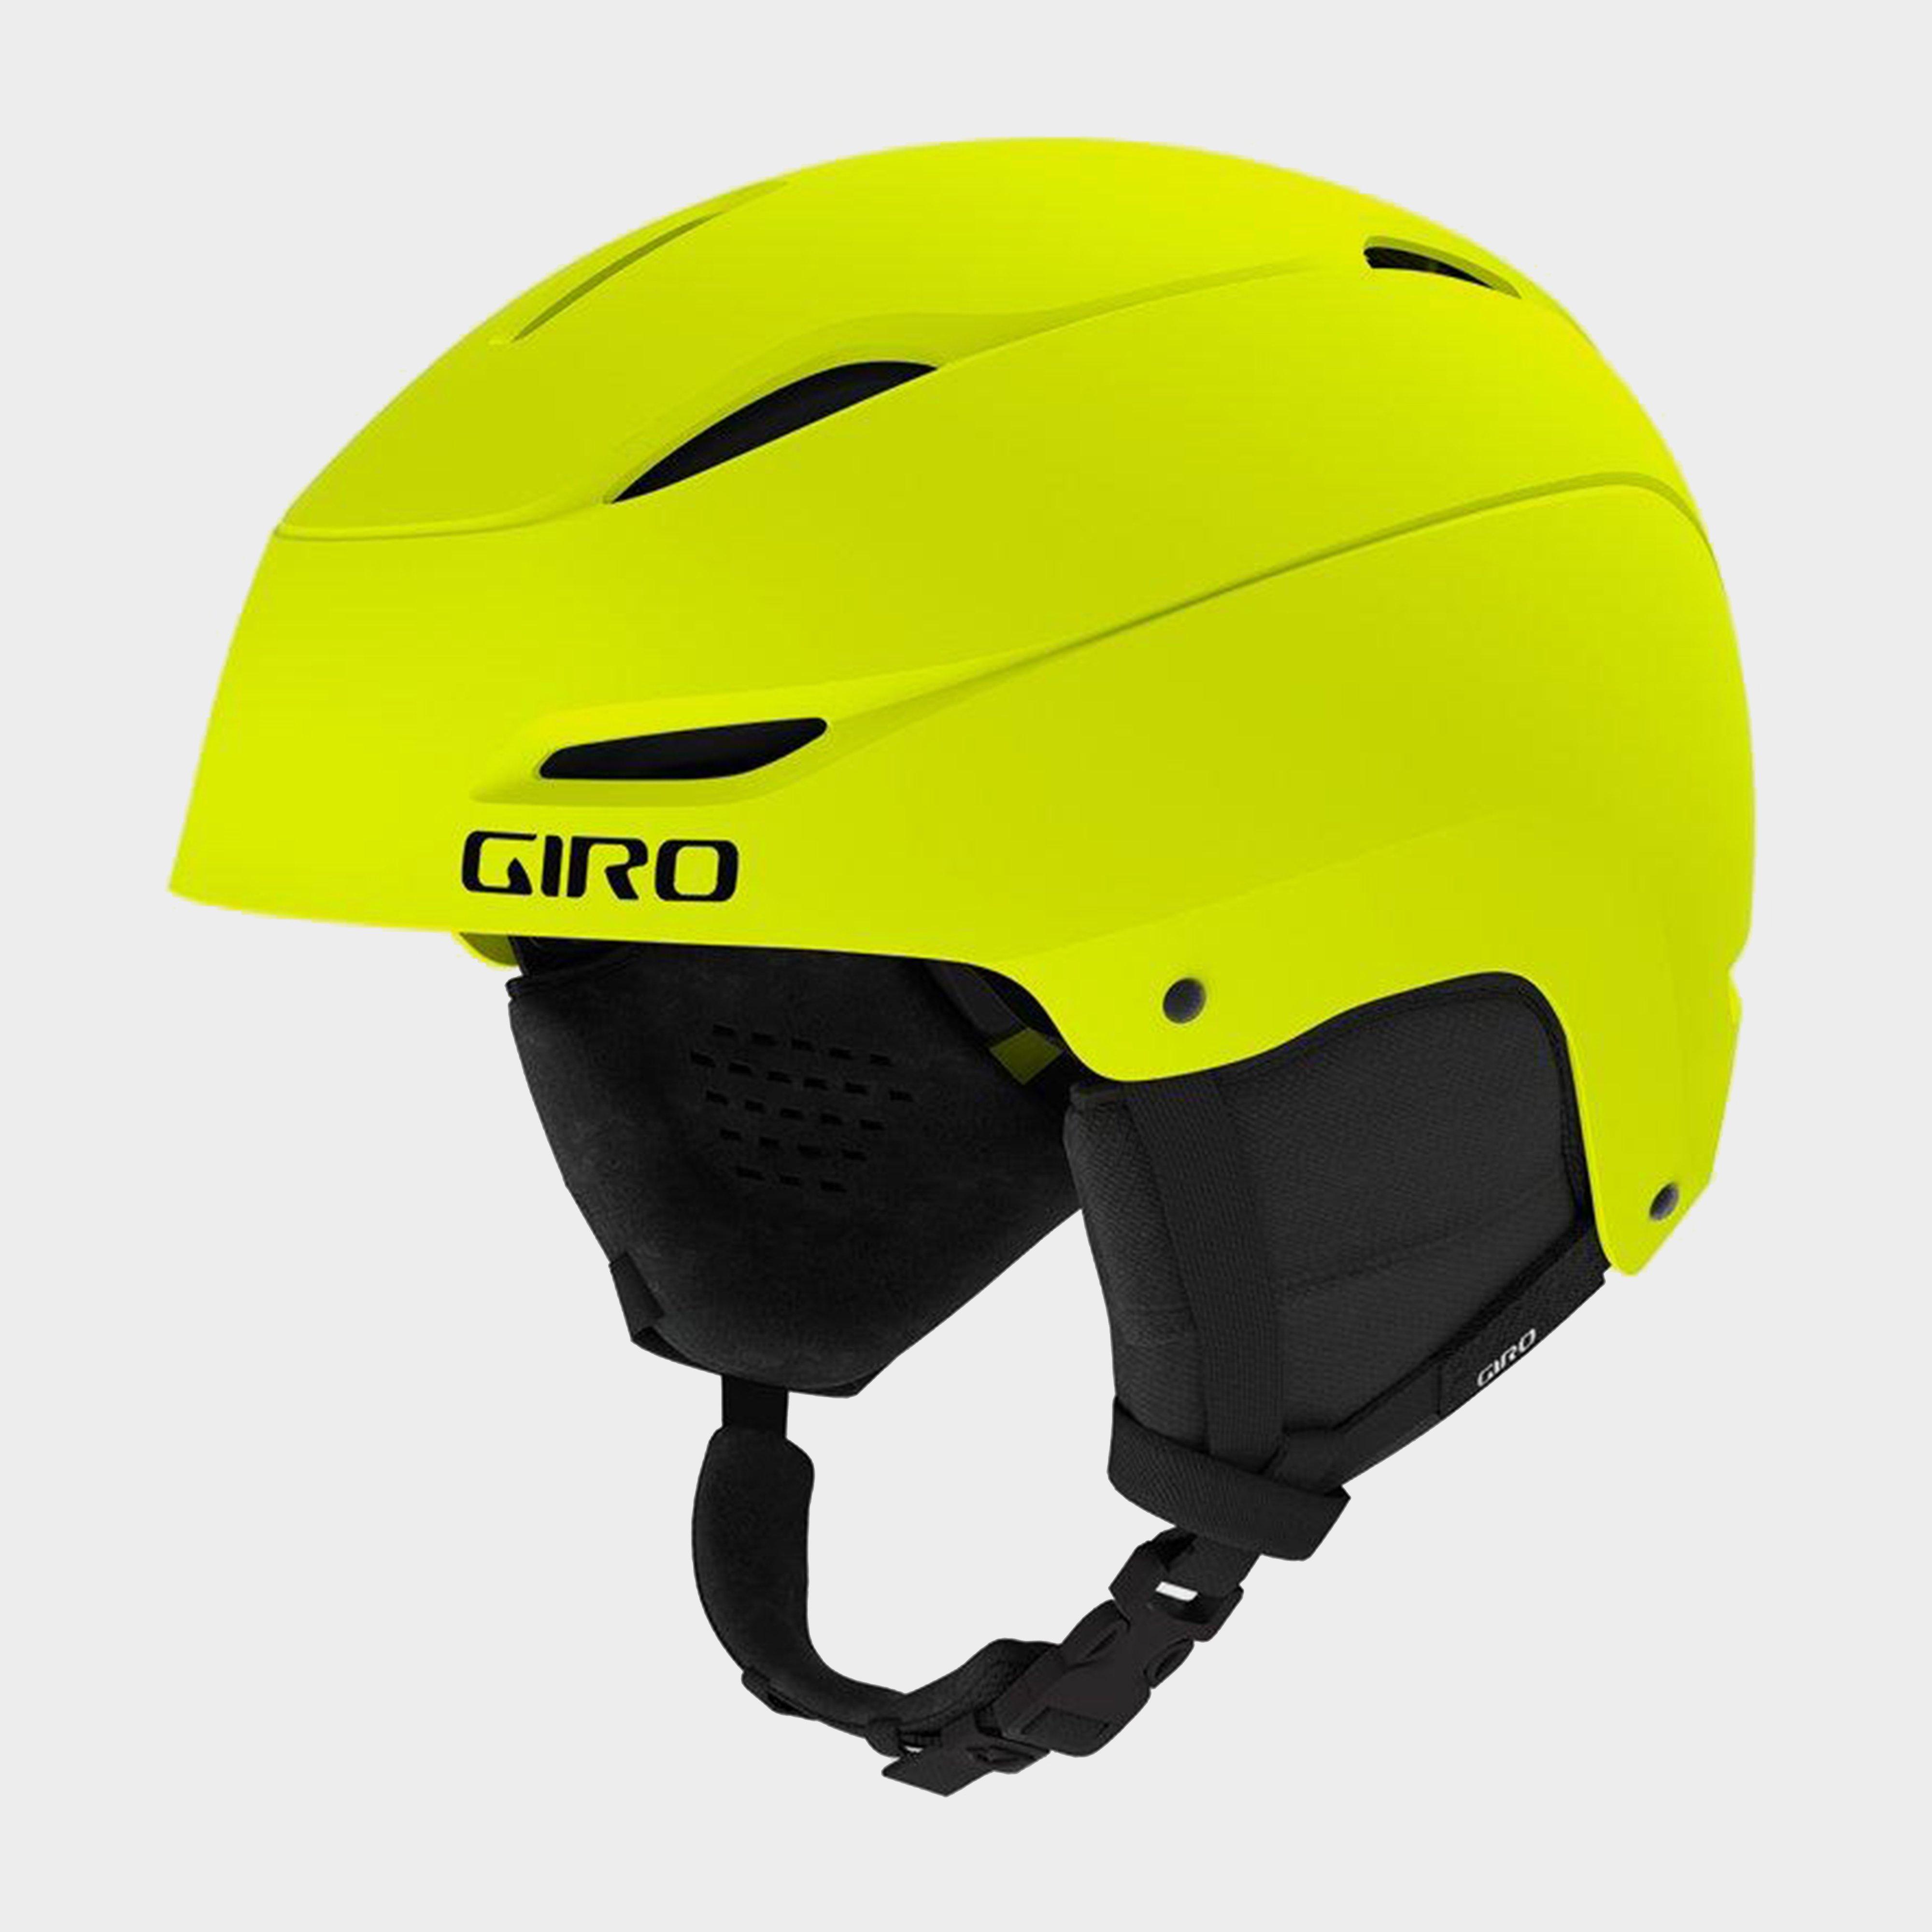 GIRO Ratio Snow Helmet, Yellow/YEL